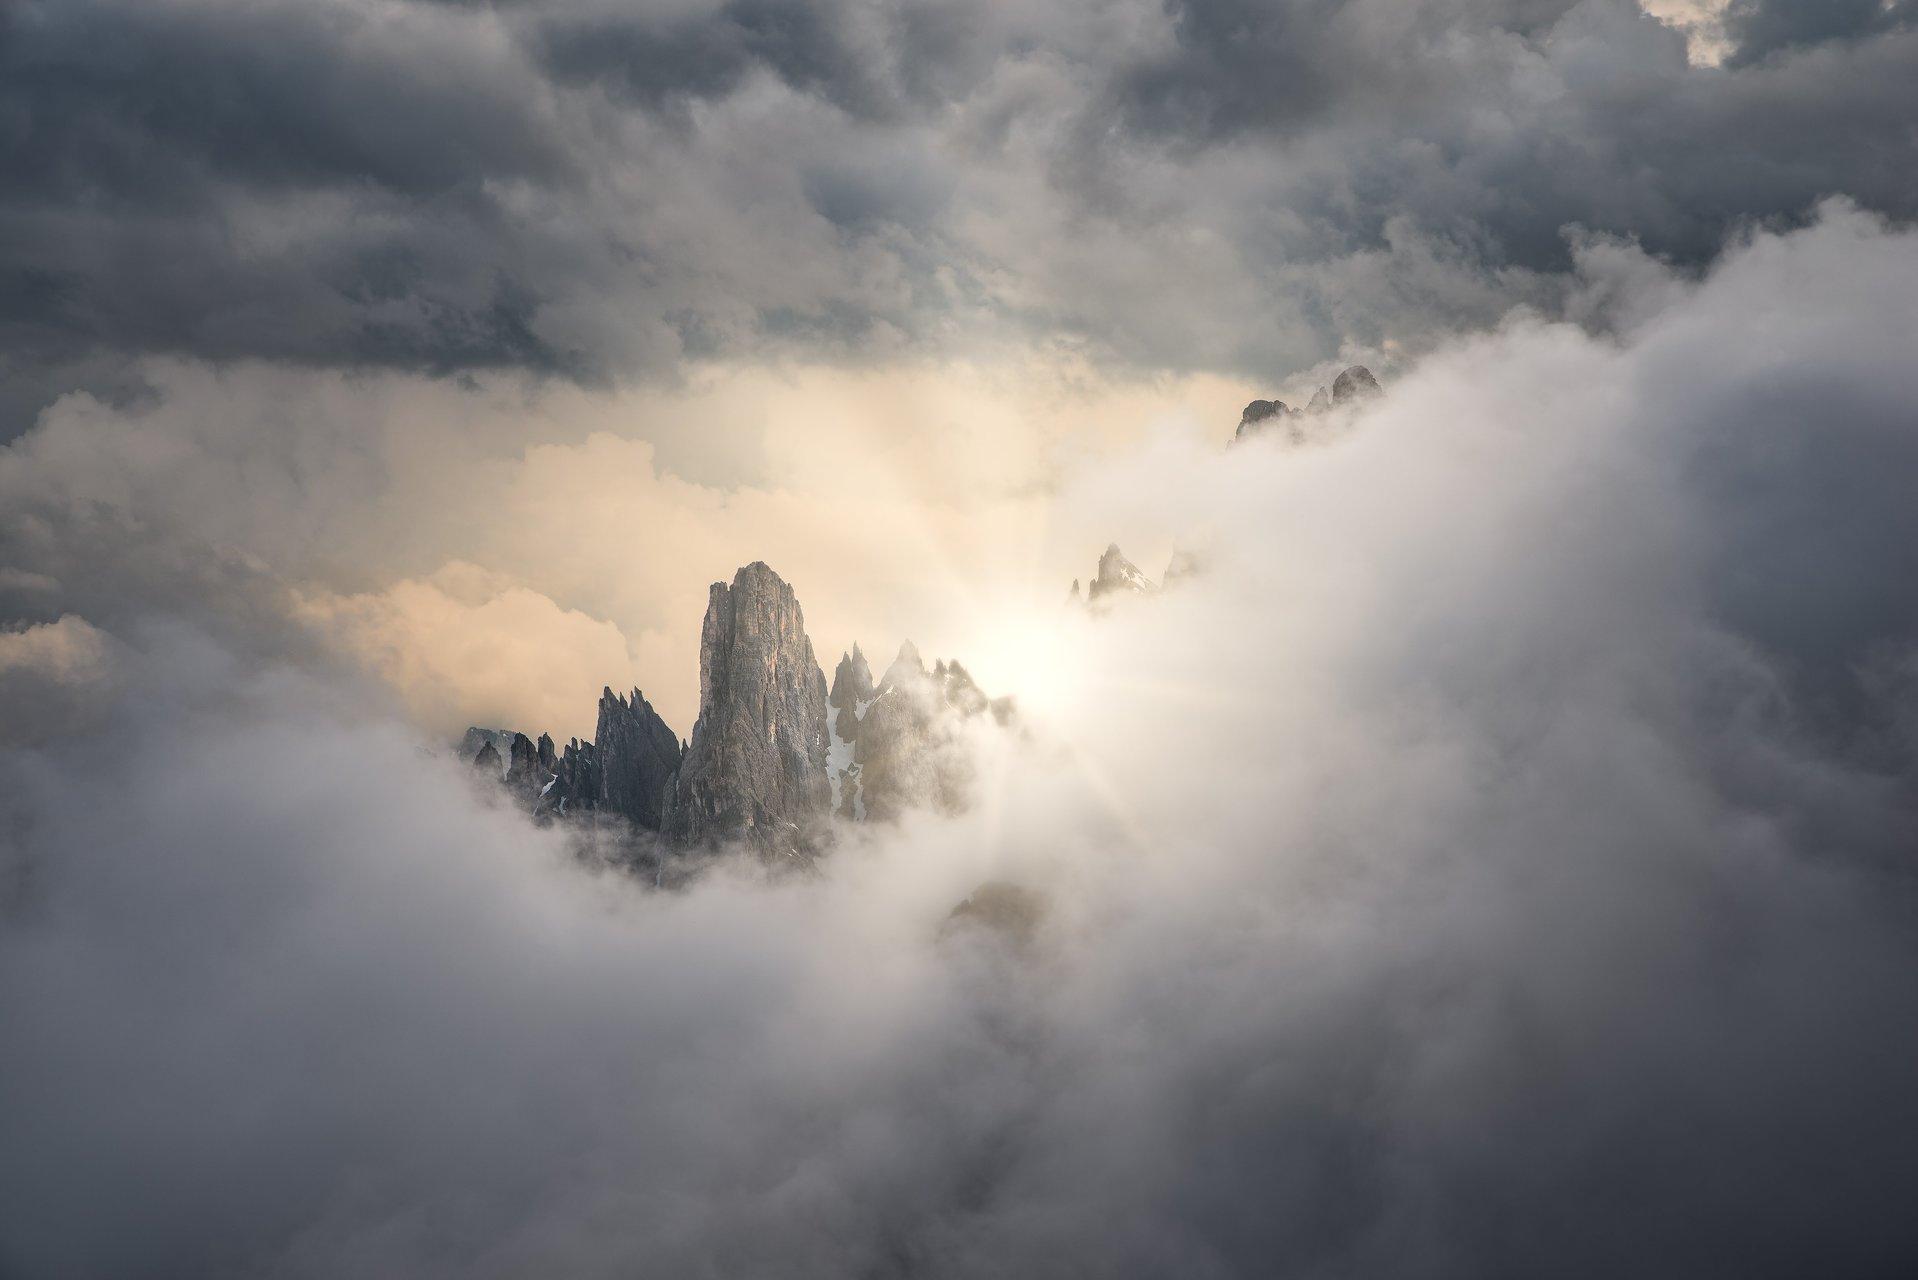 Photo in Landscape | Author donevcc | PHOTO FORUM